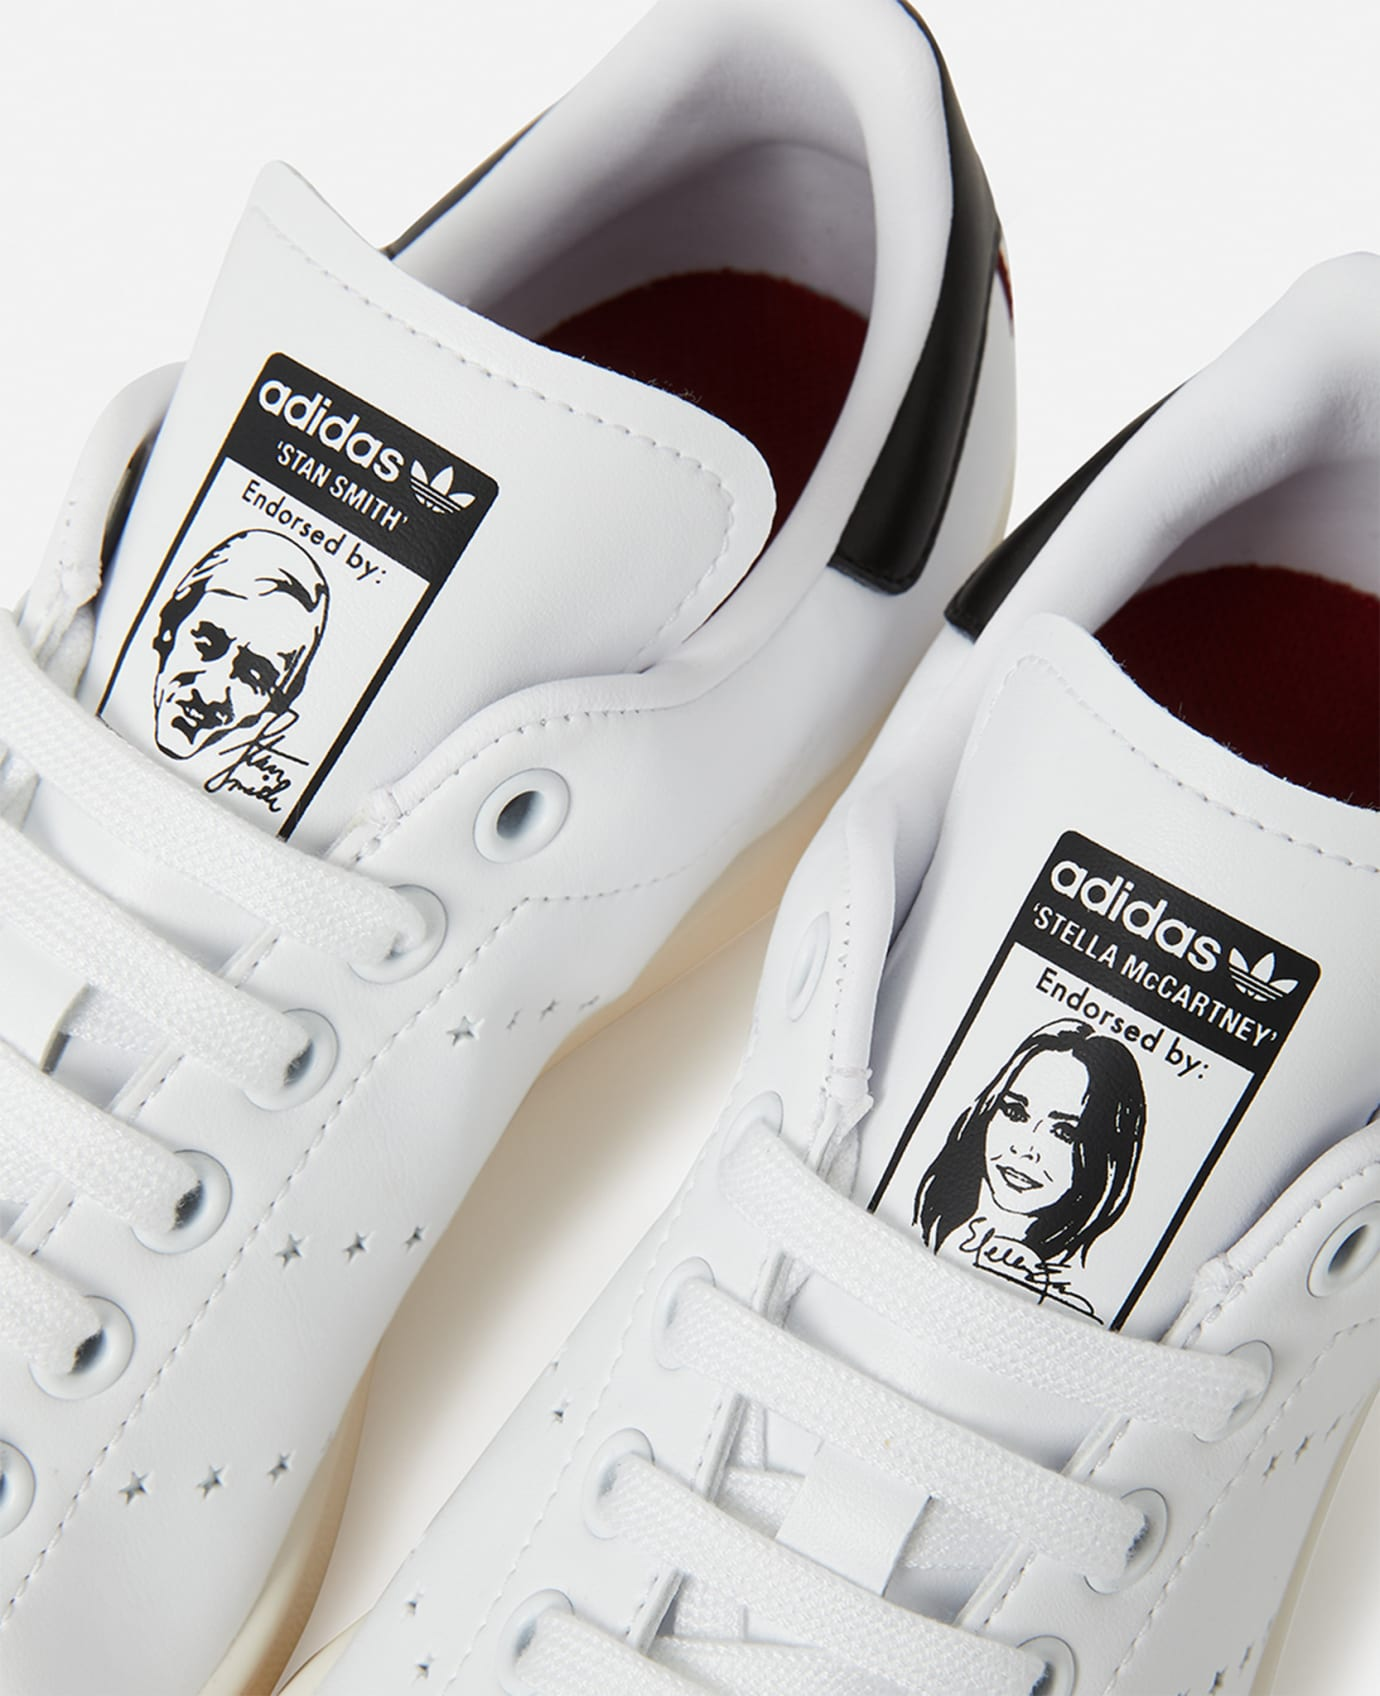 Stella McCartney x Adidas Stan Smith (Tongue 2)